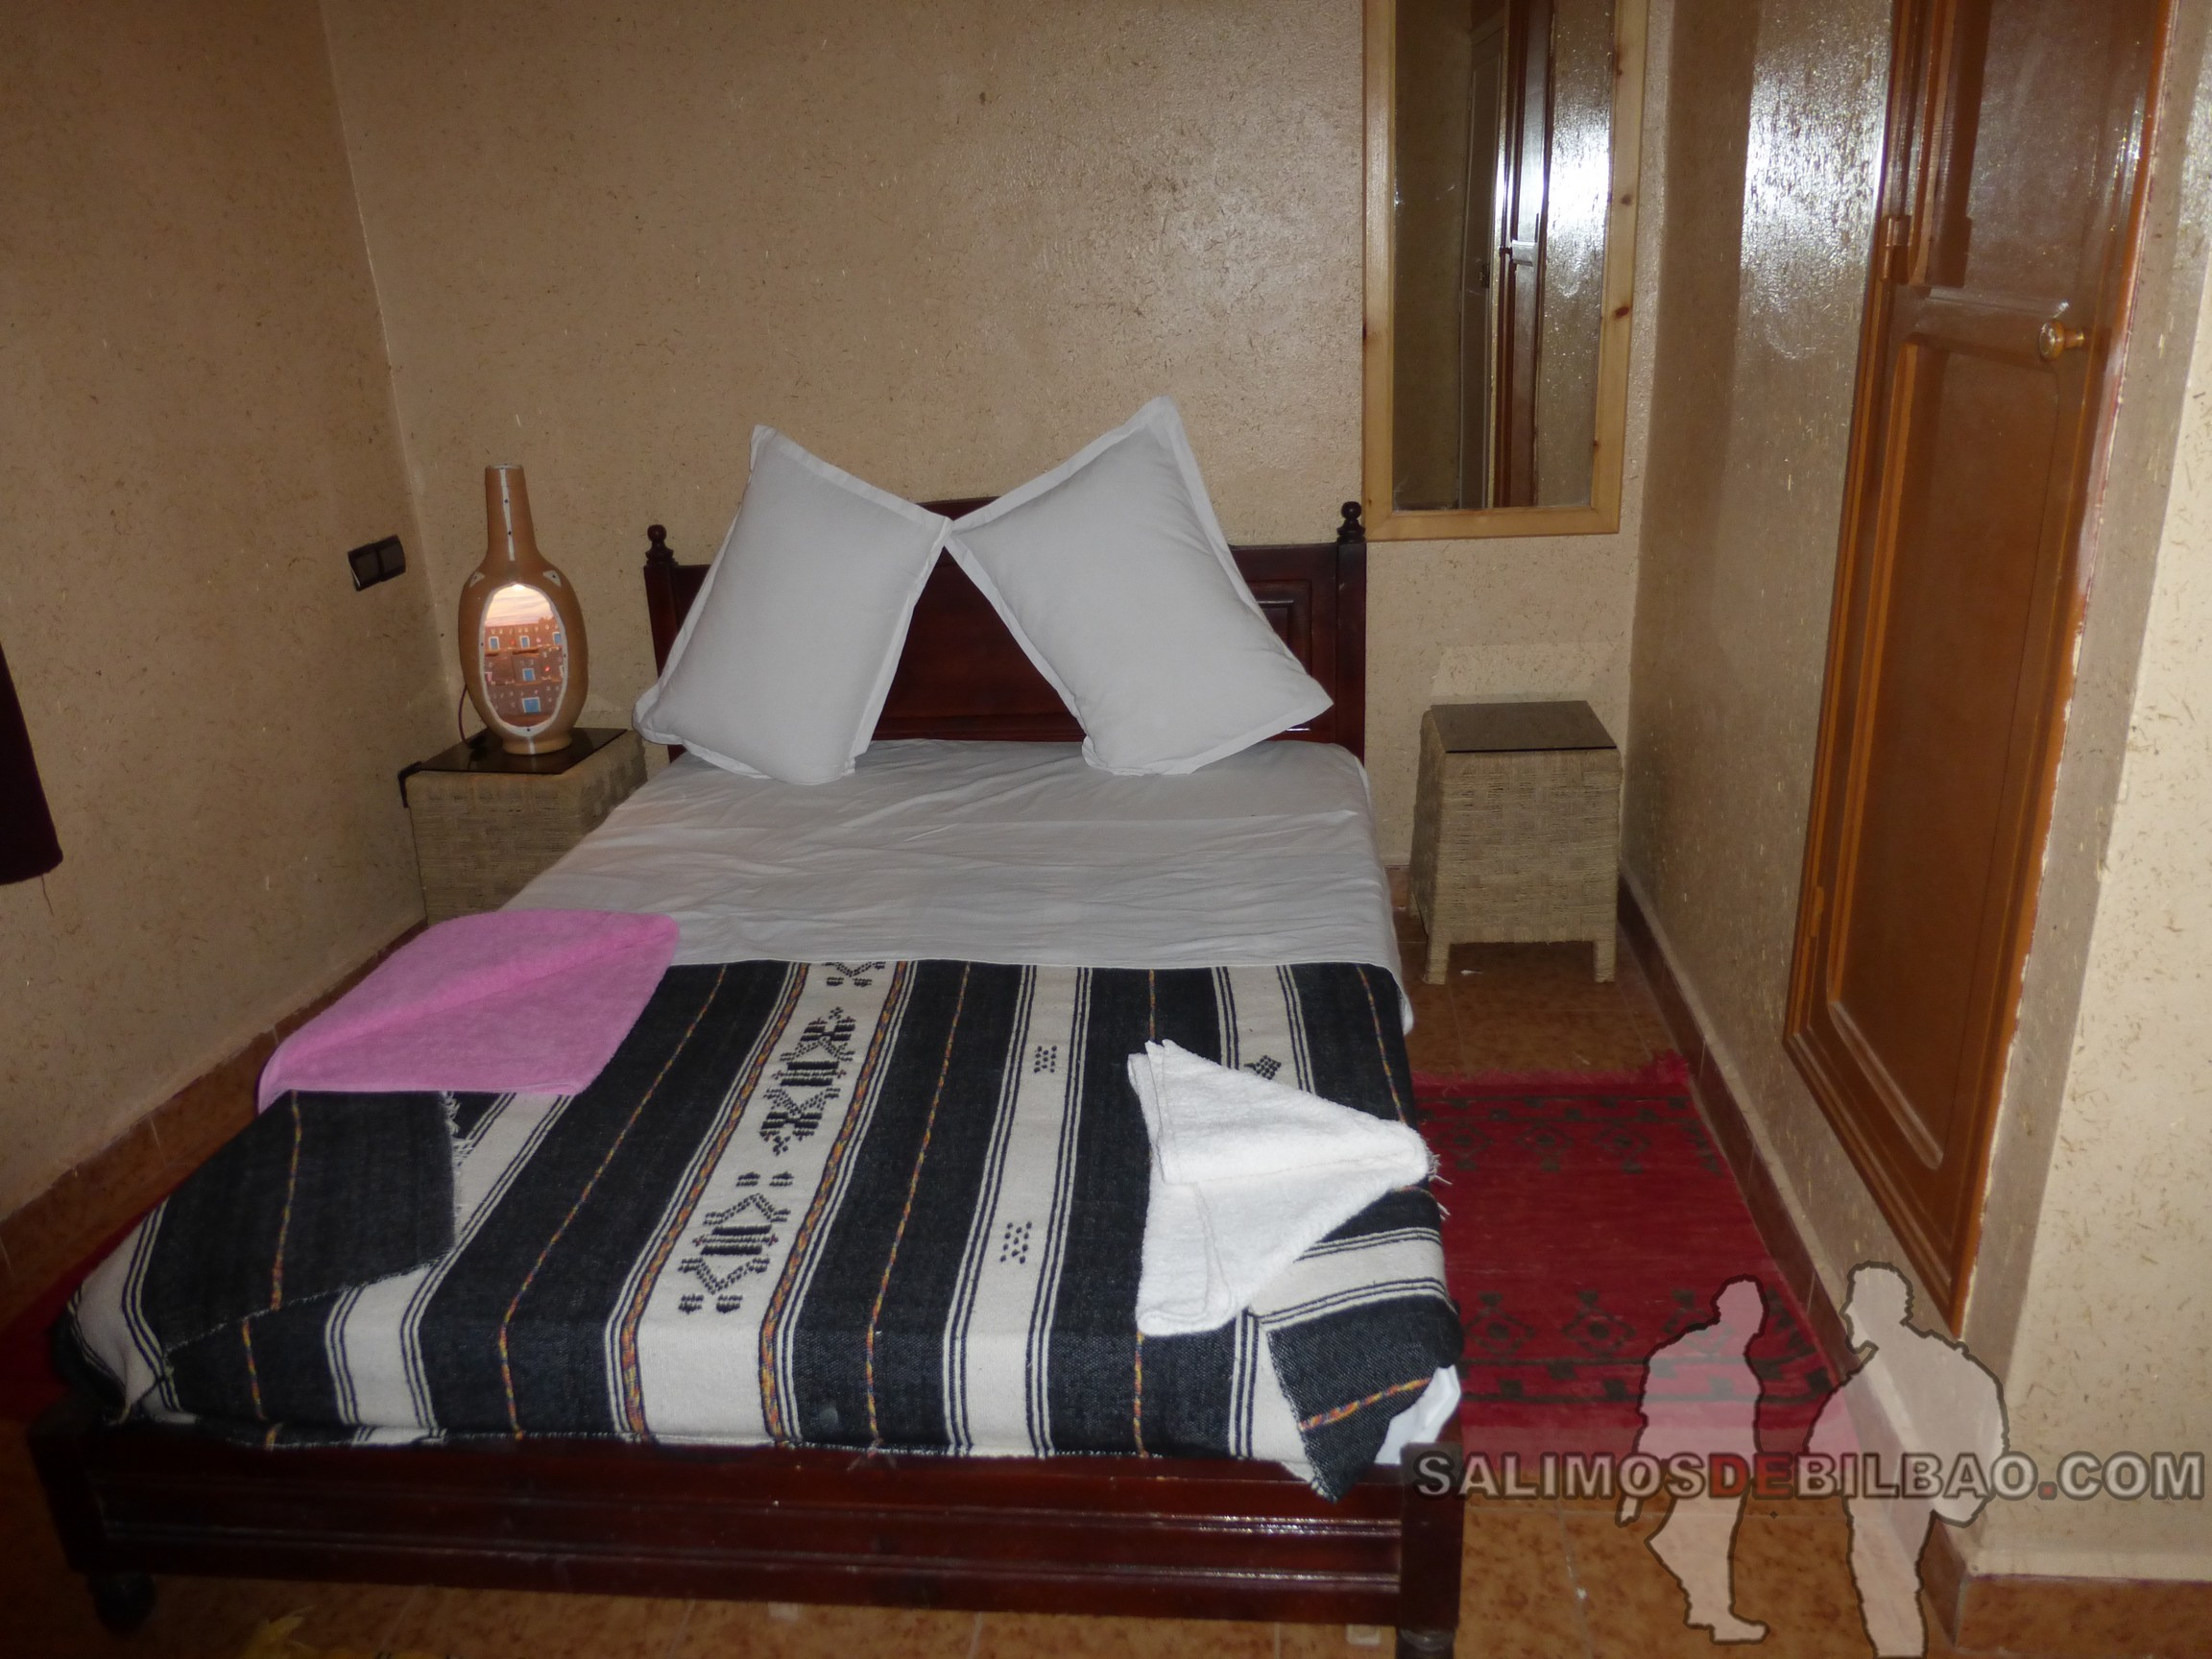 465. Hotel La Baraka, Kasbah Ait Ben Haddou